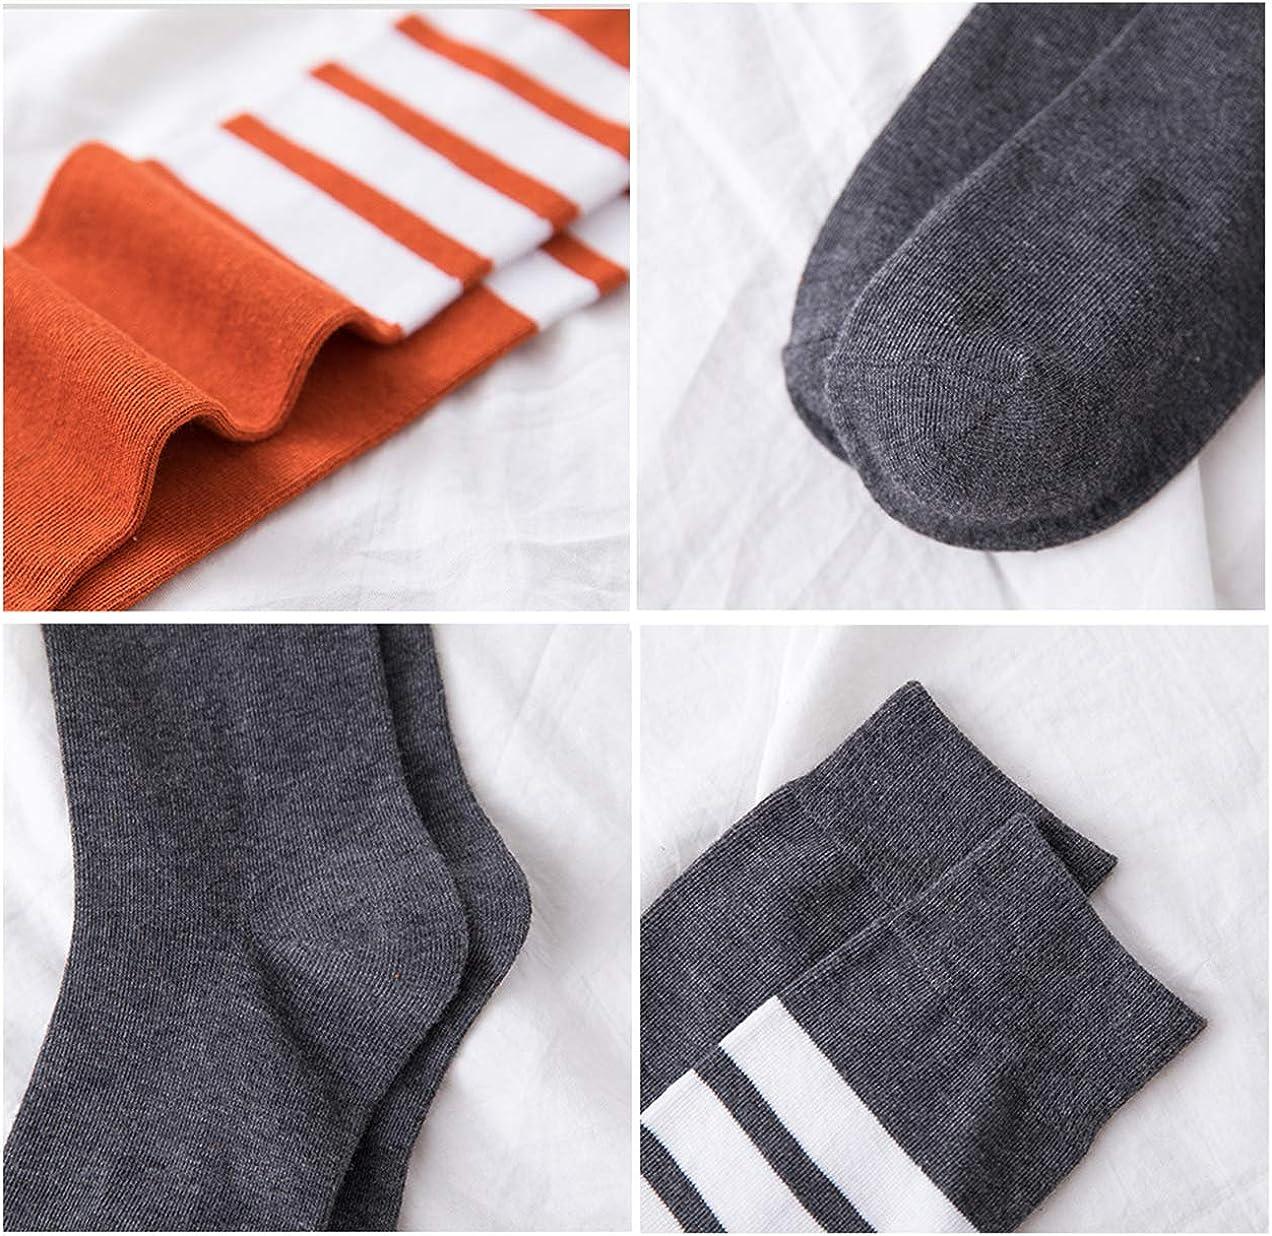 Anchovy Women Stripe Knee High Socks 4 Pack Casual Cotton Stockings Tube Socks 5-9 G-22